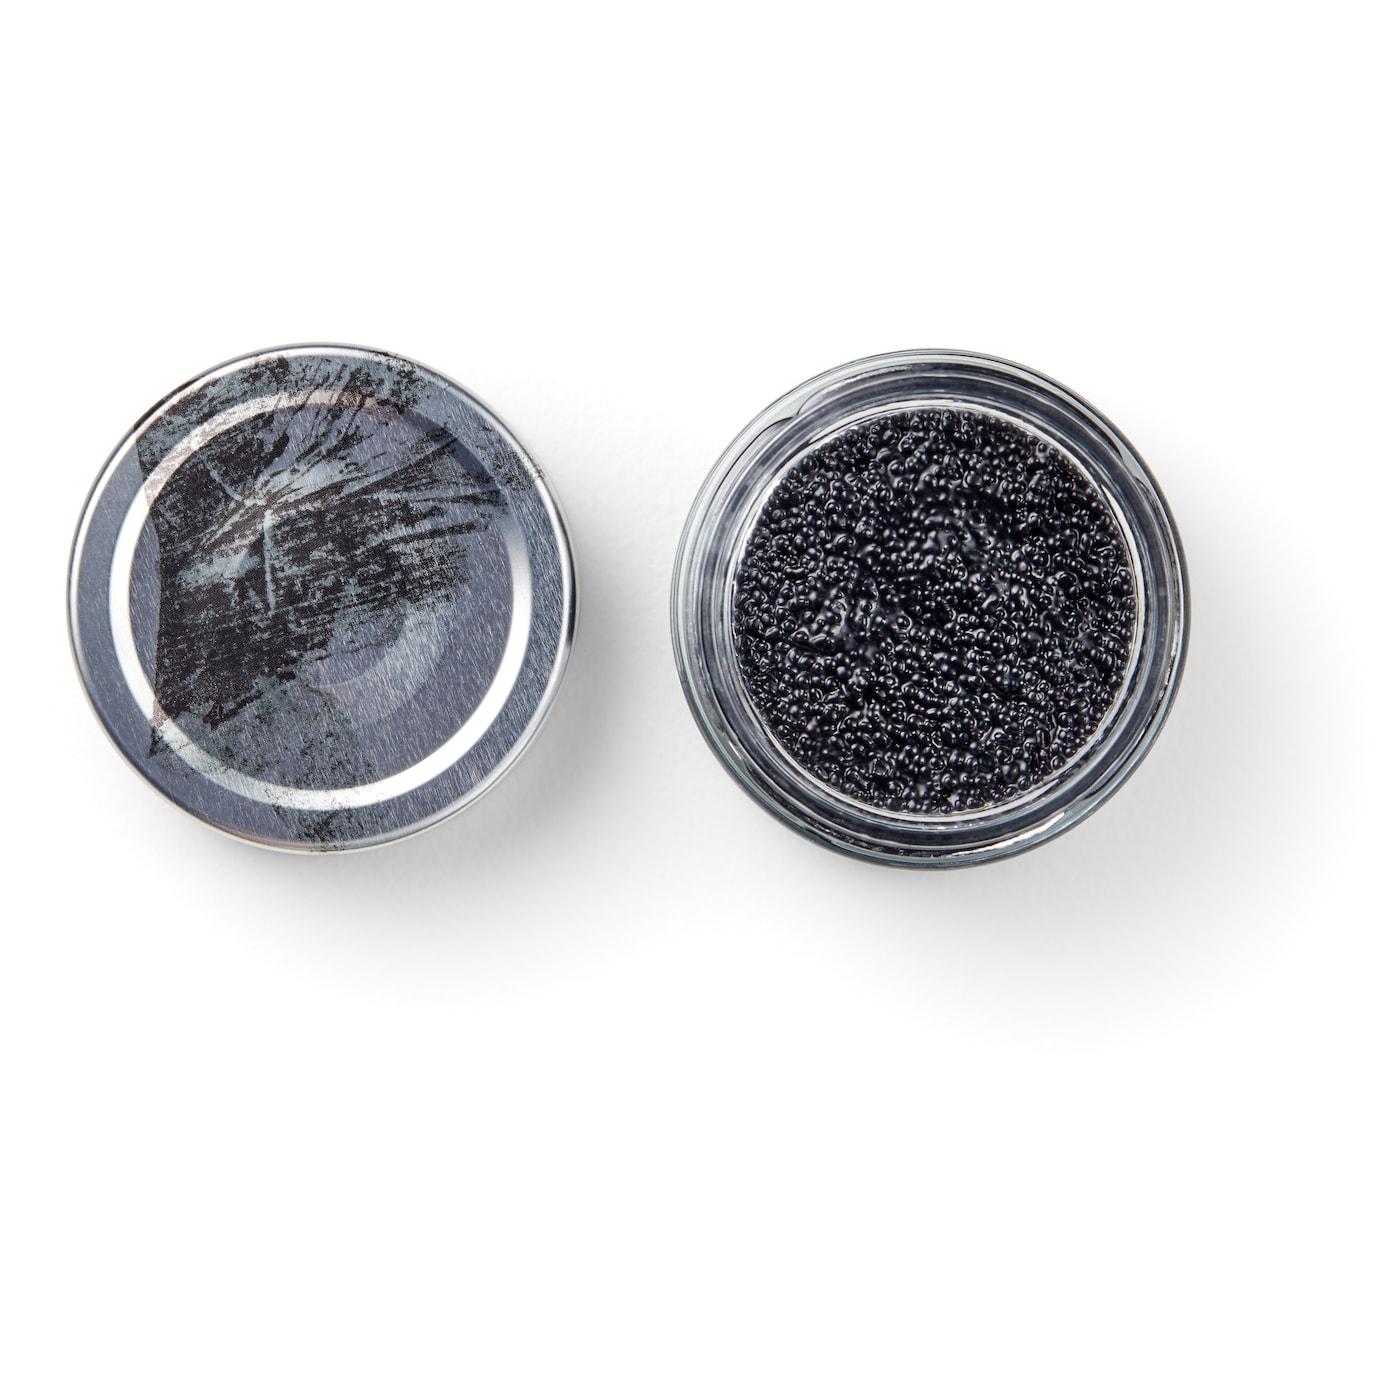 SJÖRAPPORT Seaweed pearls, black